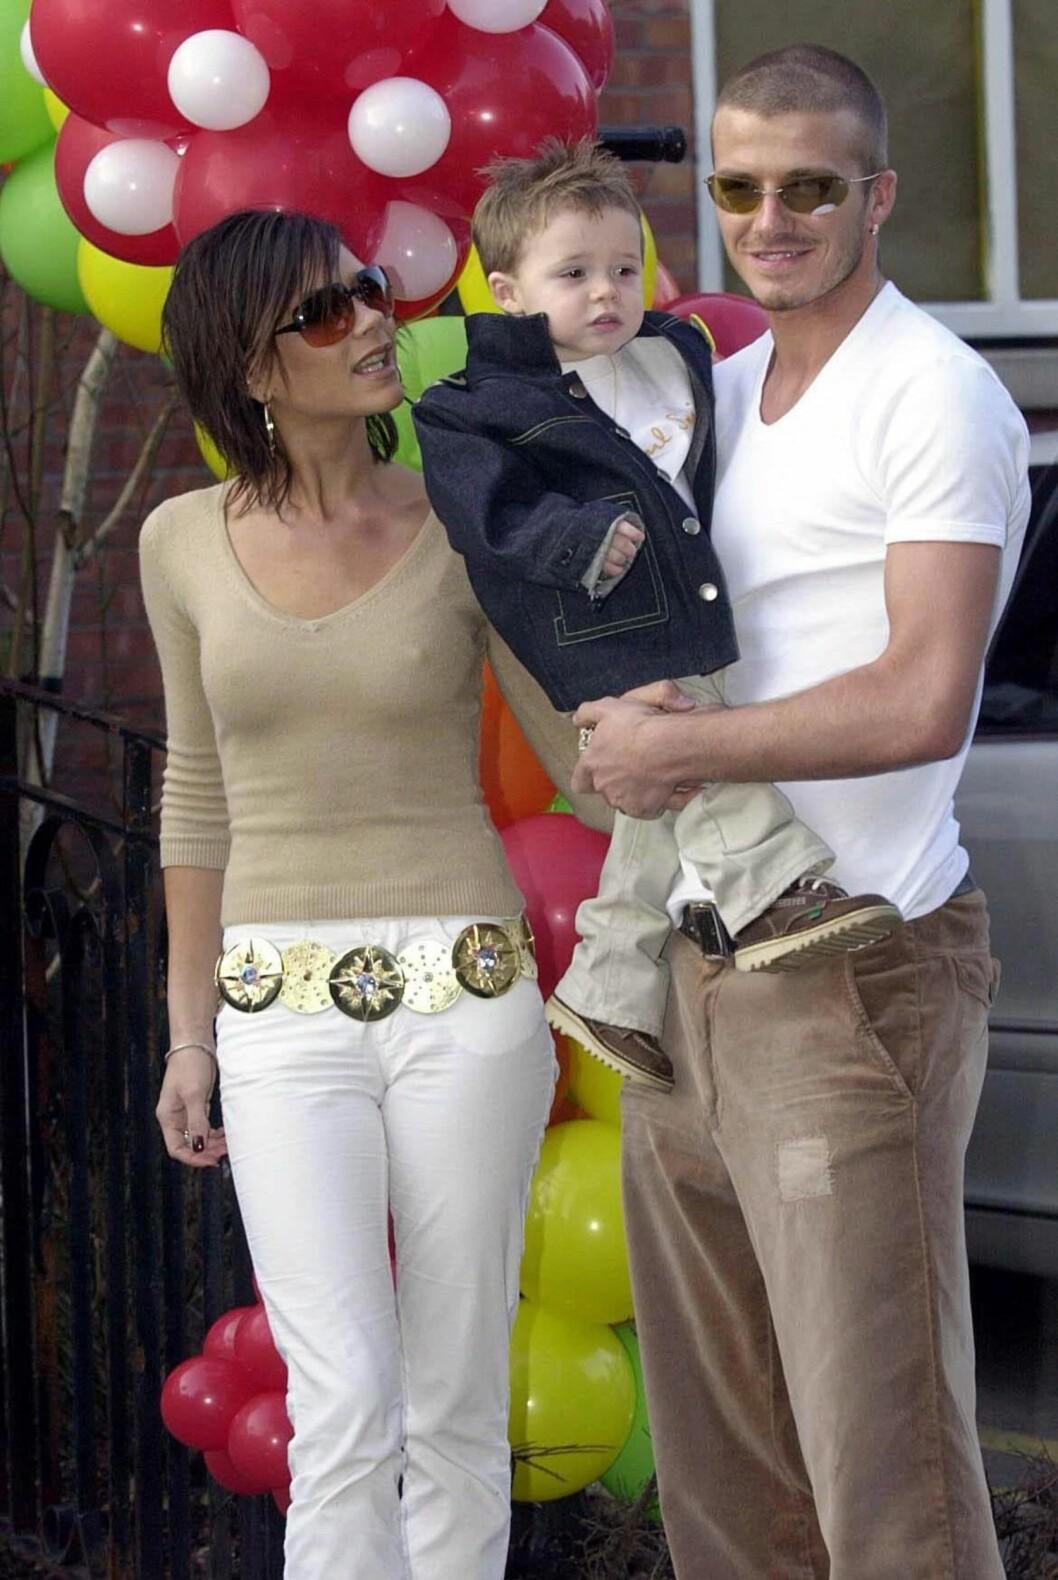 STOLT: I 1999 kom også sønnen Brooklyn Beckham til verden. Dette bildet er tatt i forbindelse med Brooklyns 2-årsdag. Foto: NTB Scanpix